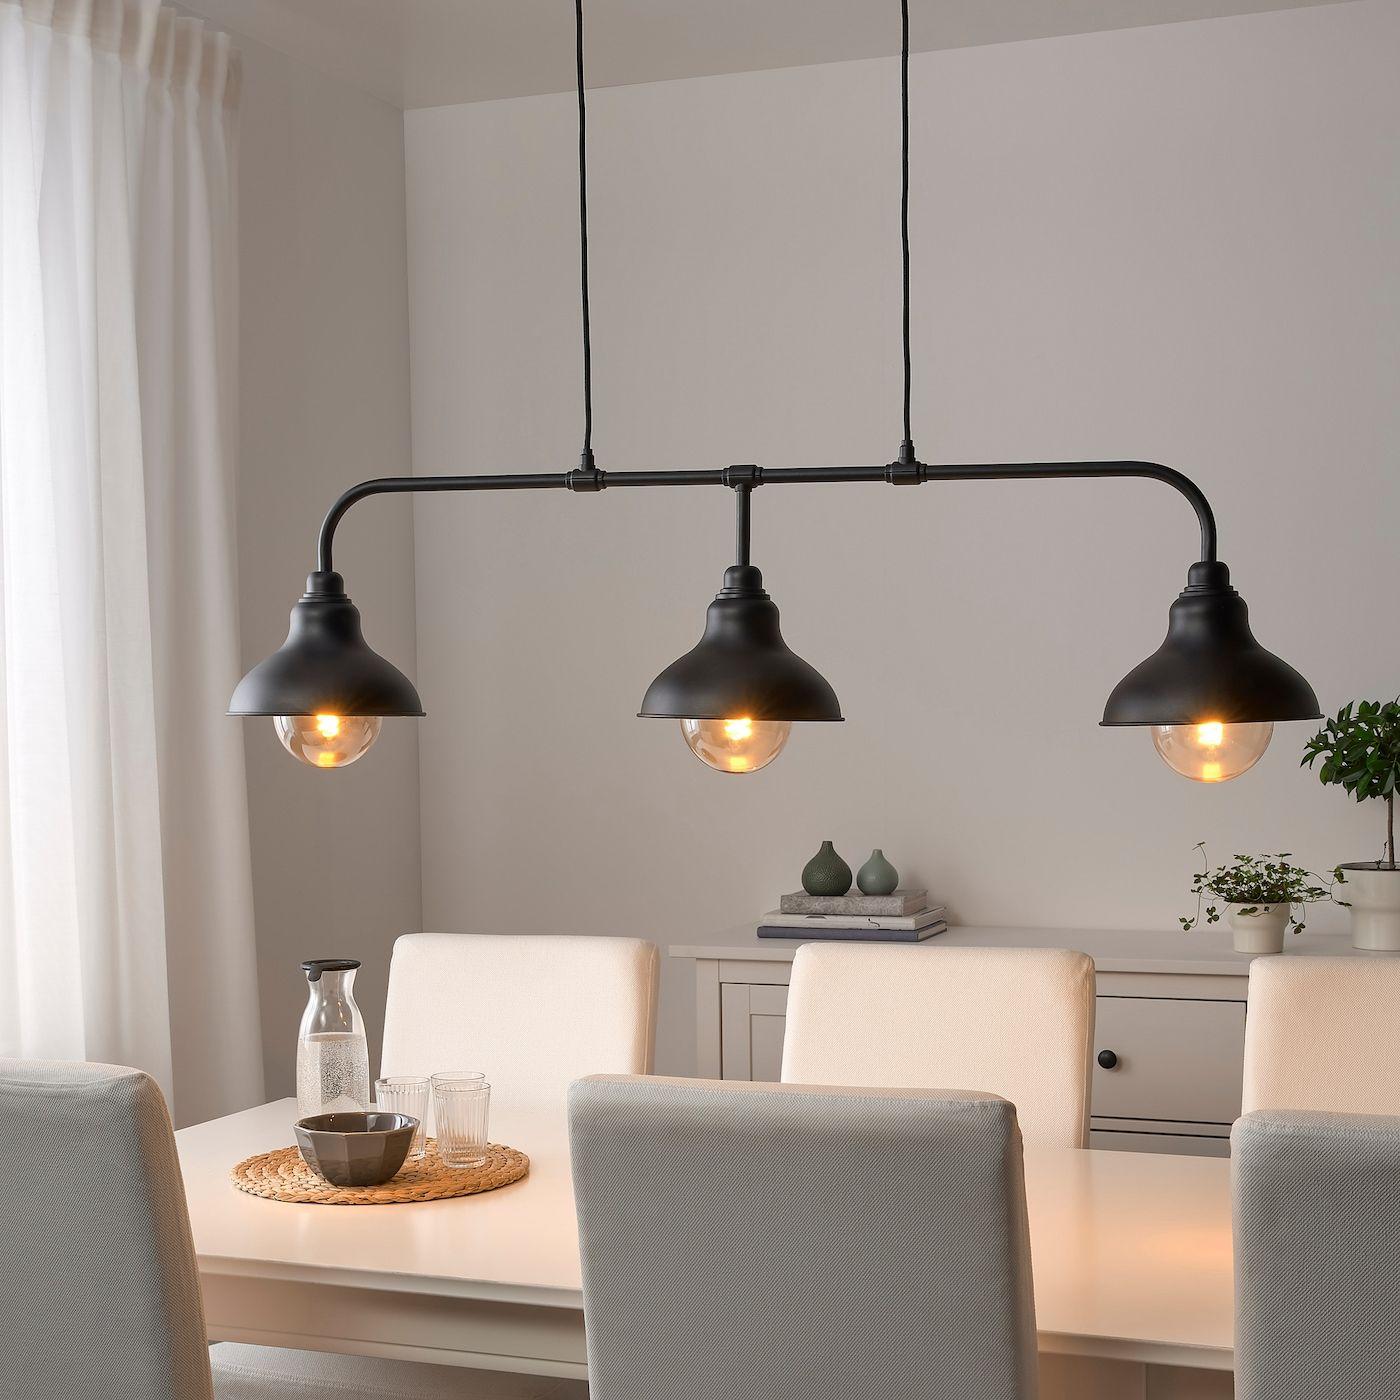 Agunnaryd Hangeleuchte Mit 3 Lampen Schwarz Ikea Deutschland Pendant Lighting Over Dining Table Black Lamps Pendant Lights Chandeliers